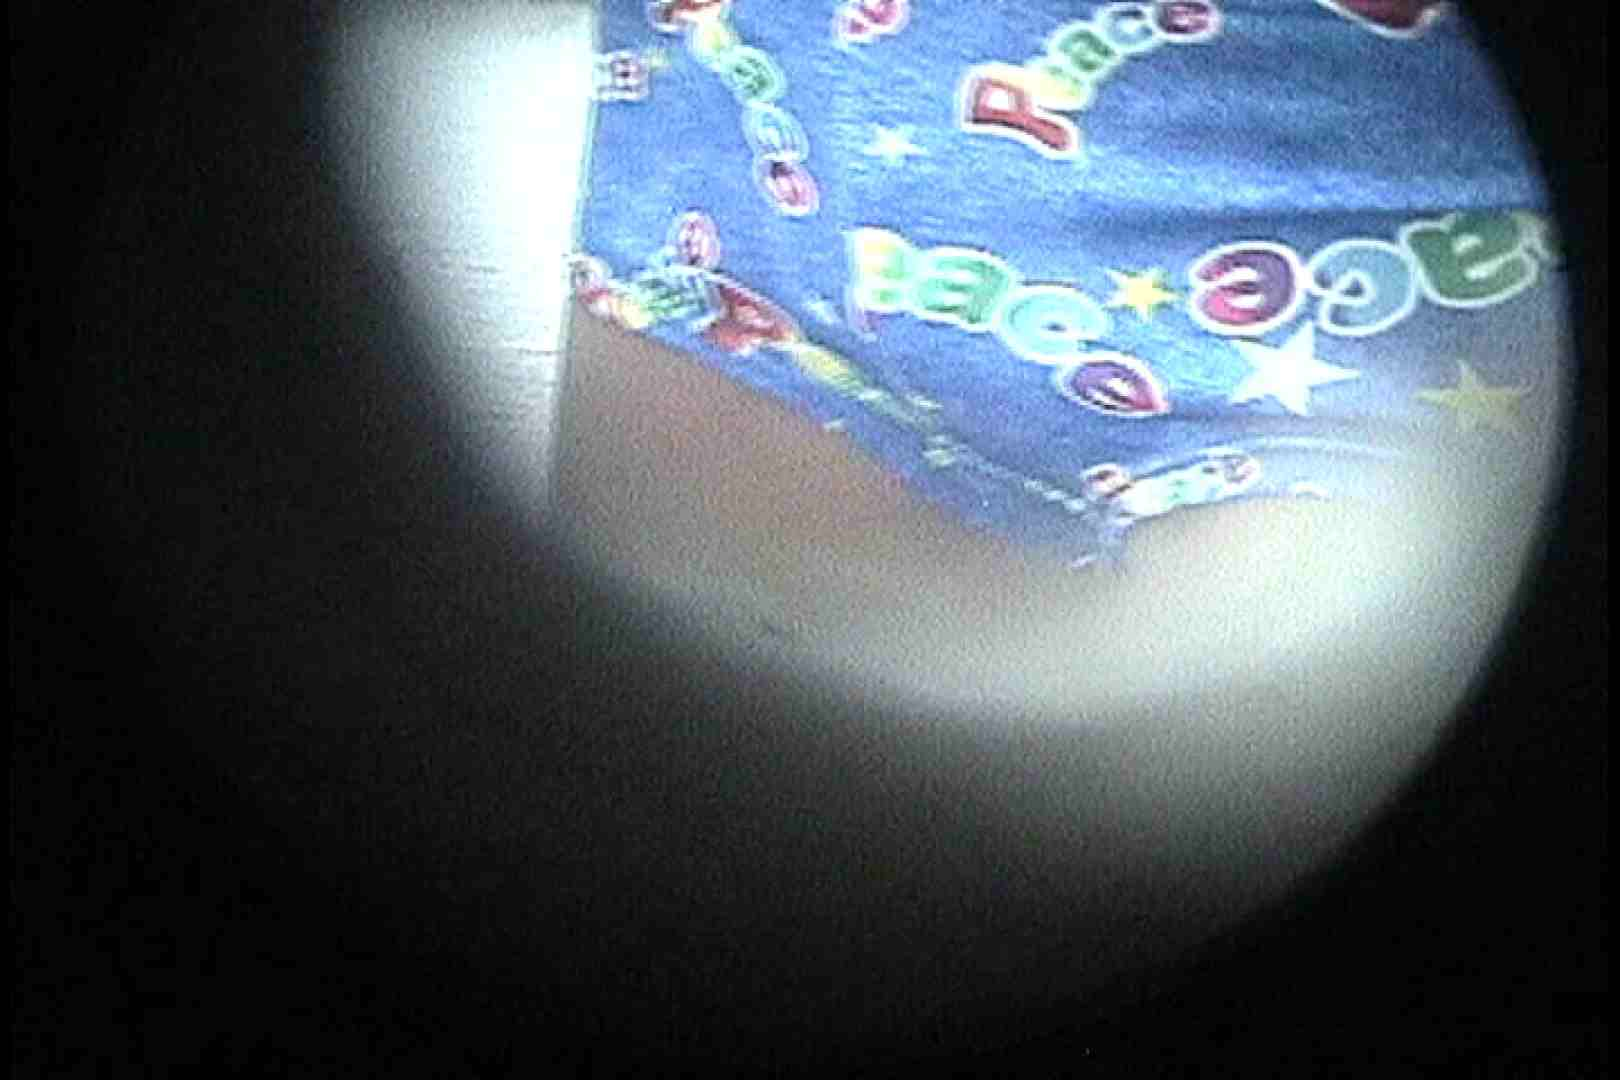 No.22 日焼け跡とオッパイの関係がおかしな貧乳ギャル 接写  99枚 52